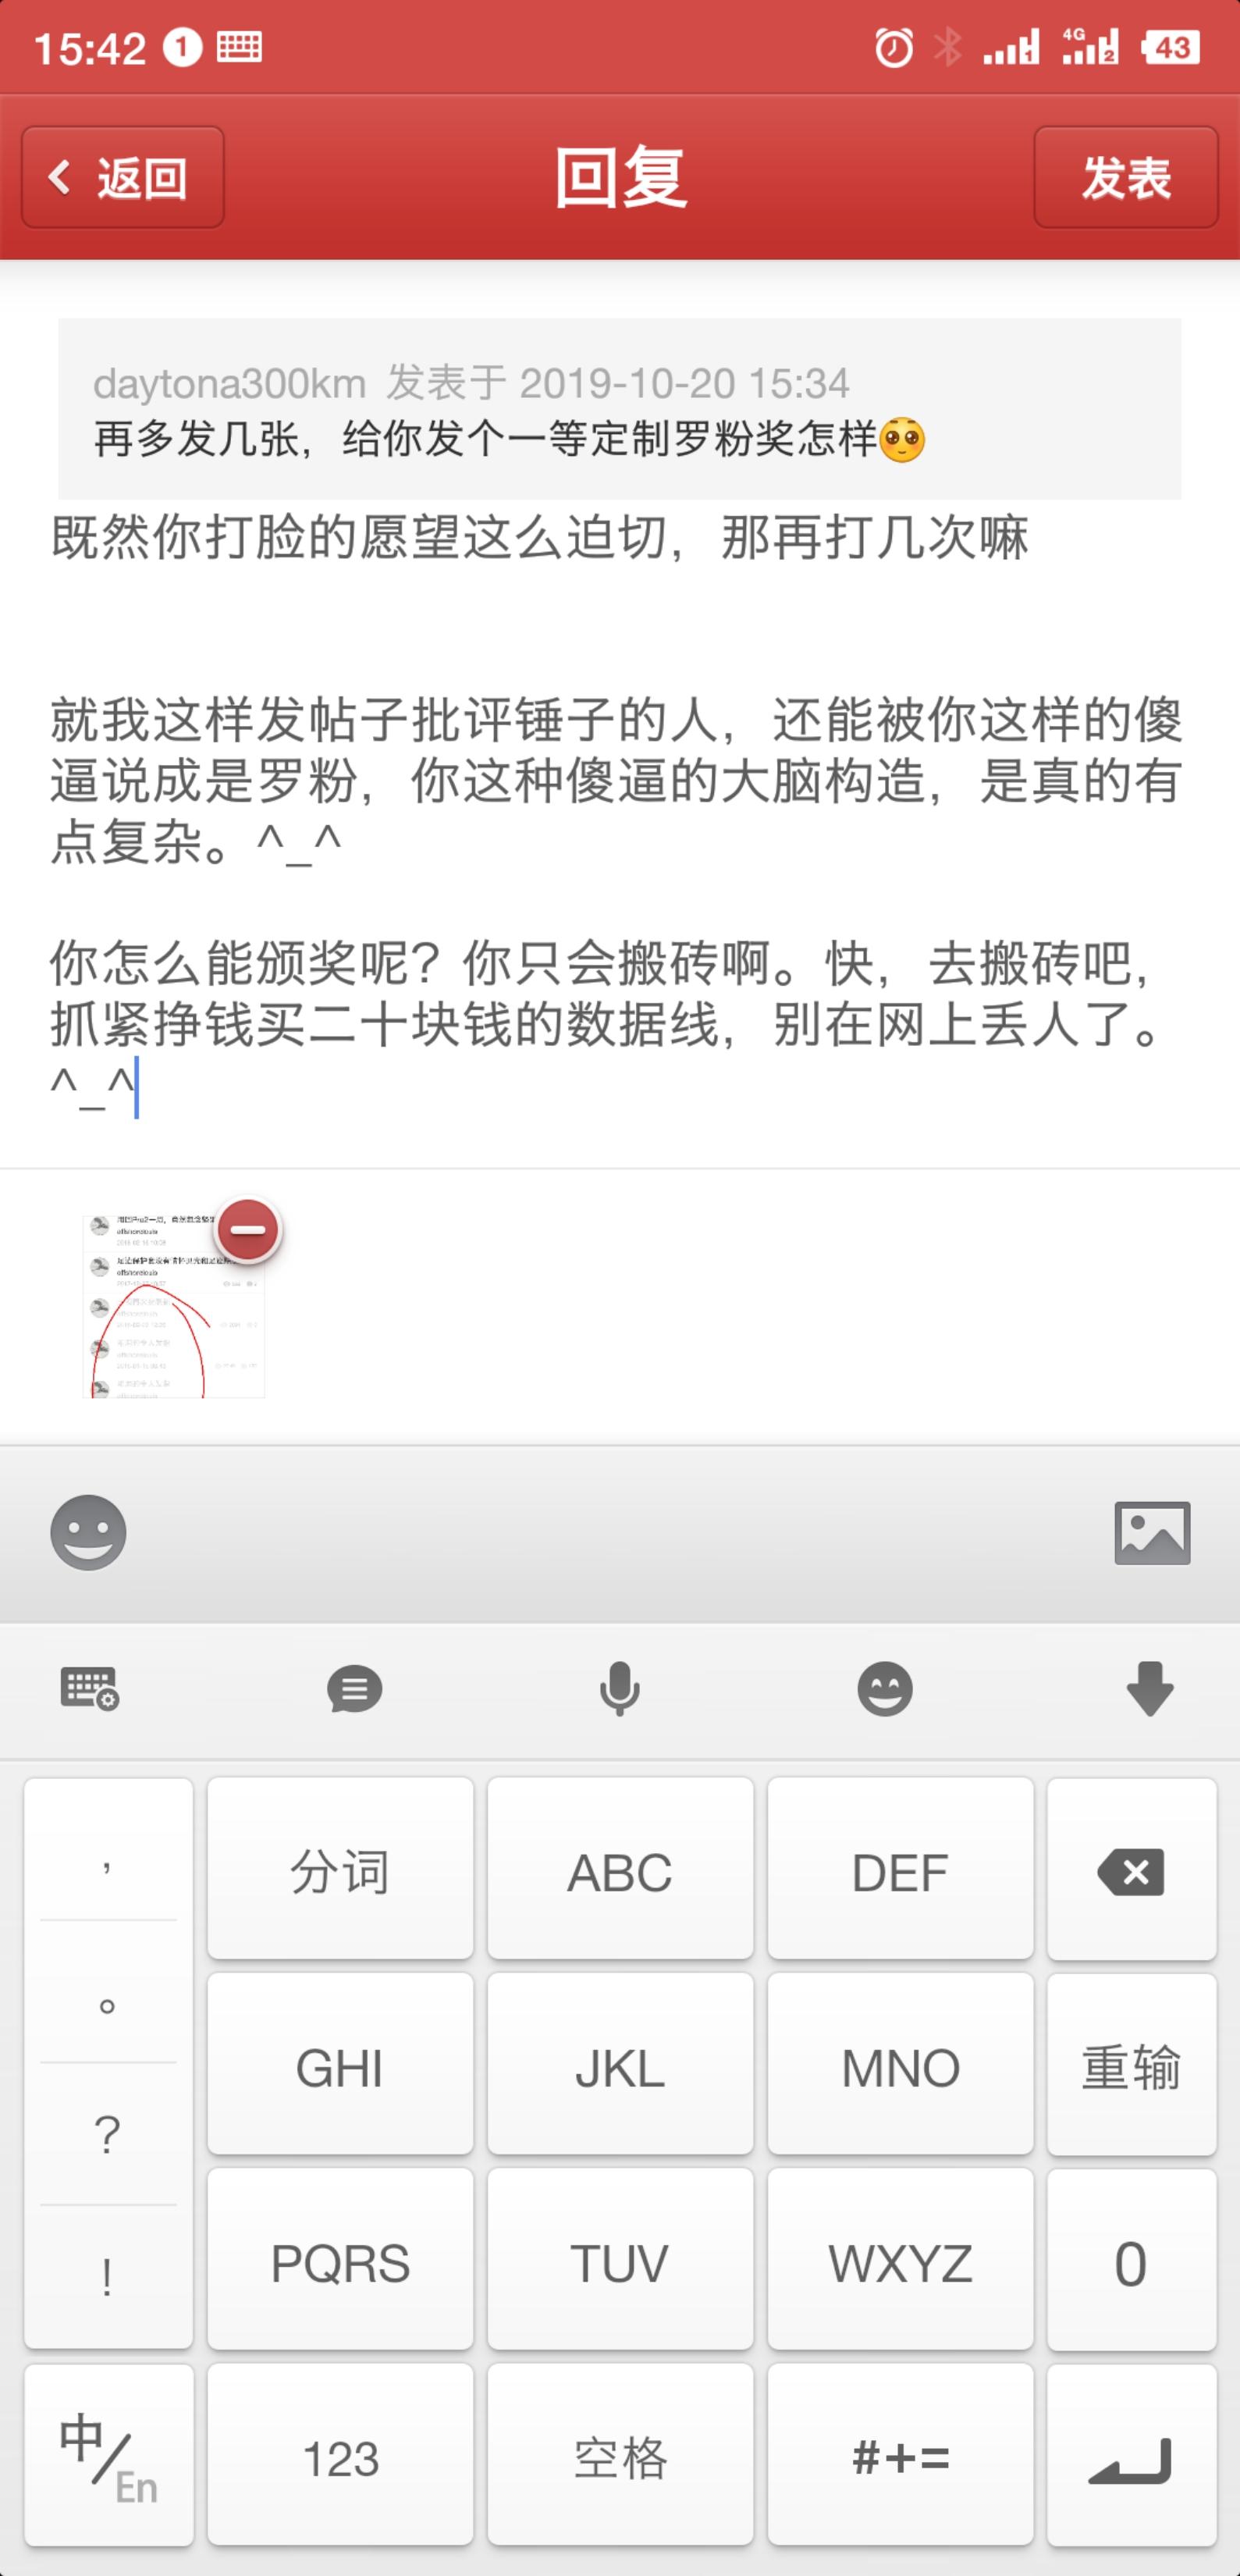 Screenshot_2019-10-20-15-42-30-271_??????.png